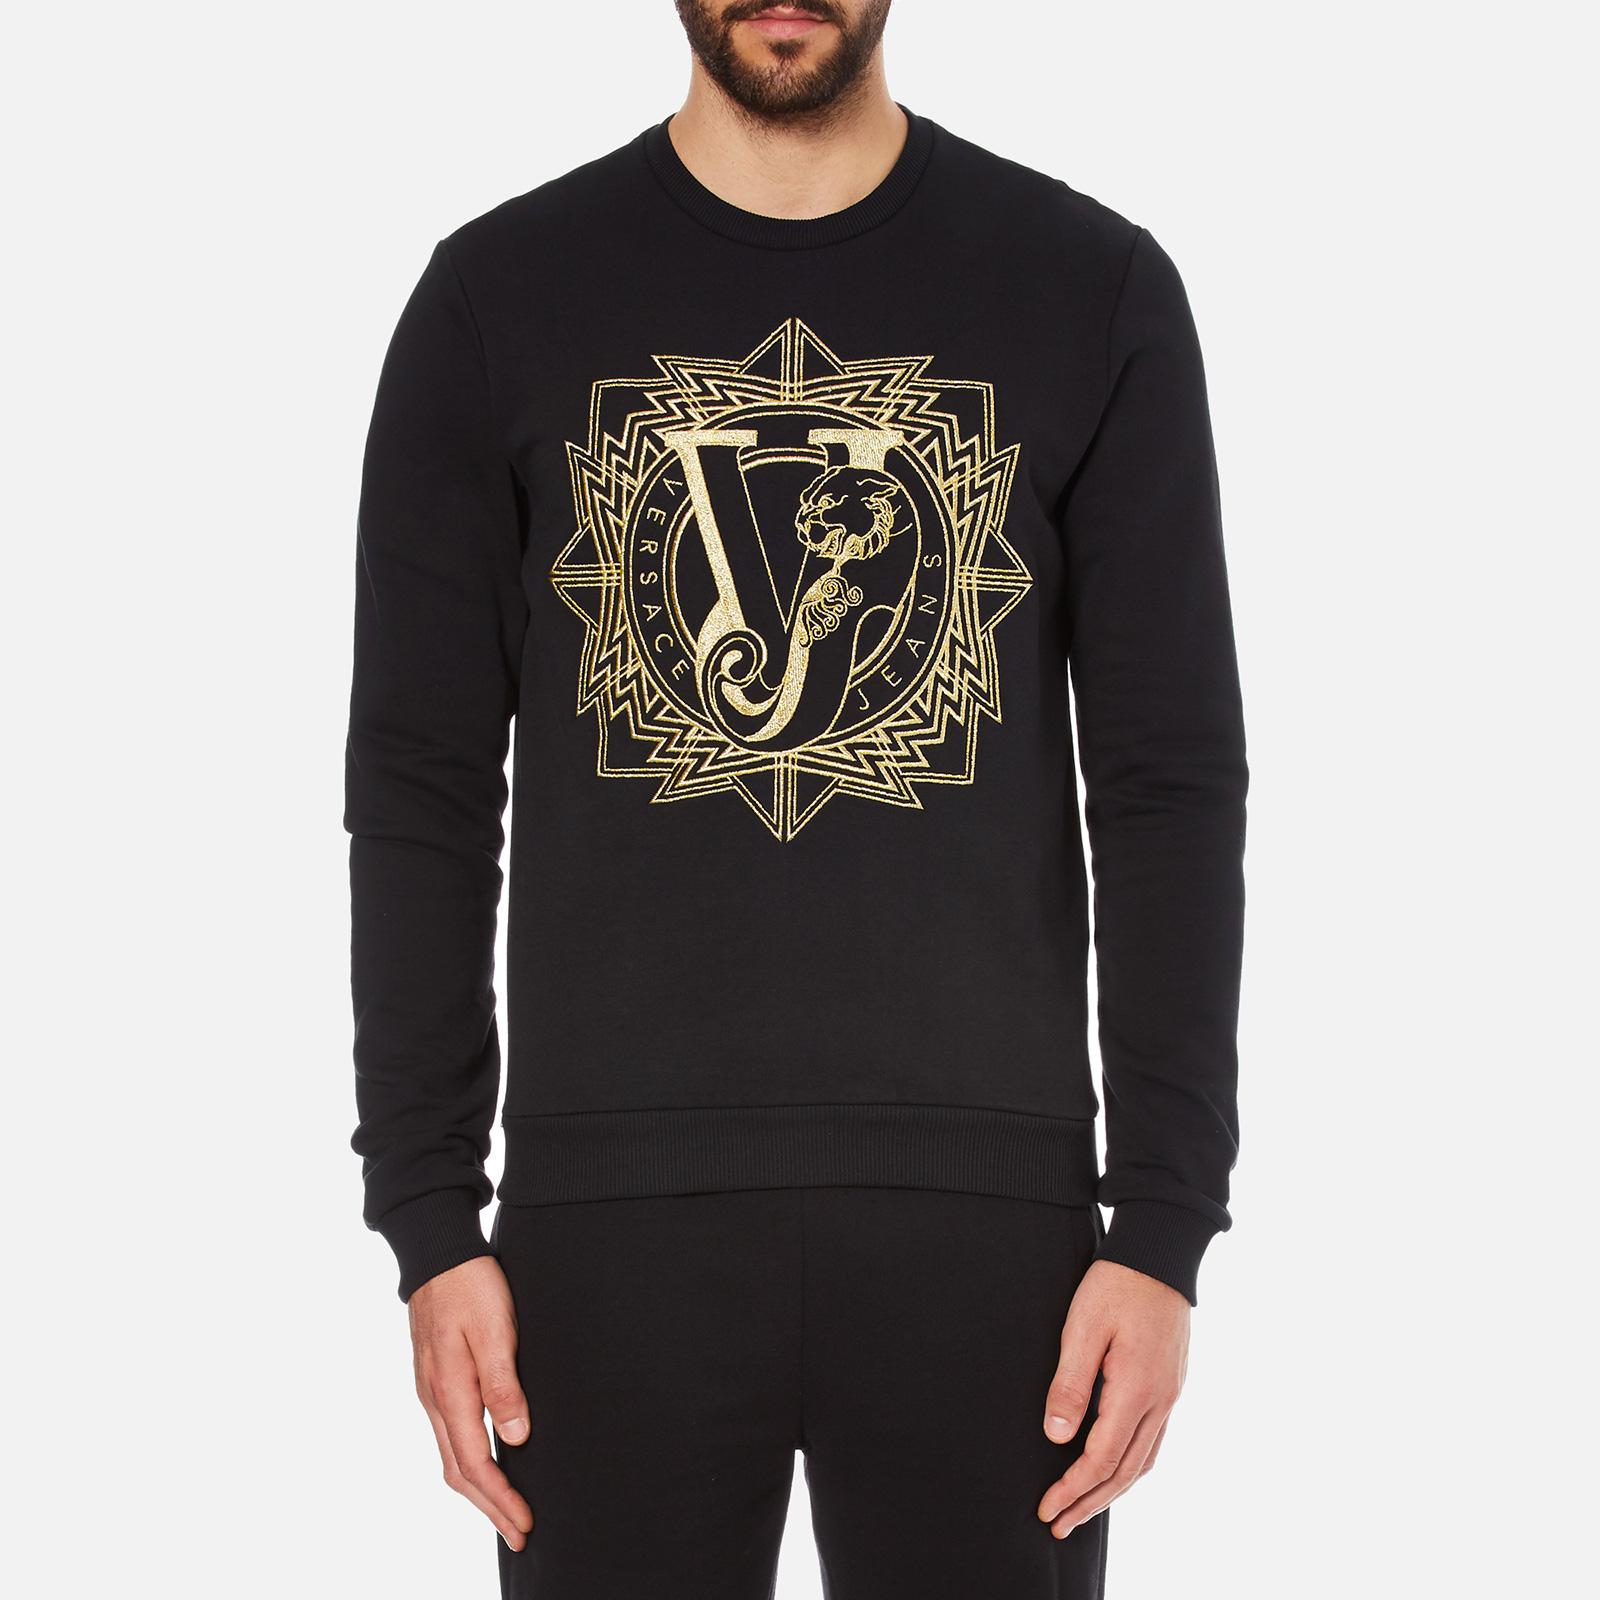 761f21bbe5 Versace Jeans Floral Sweatshirt Black   Lixnet AG